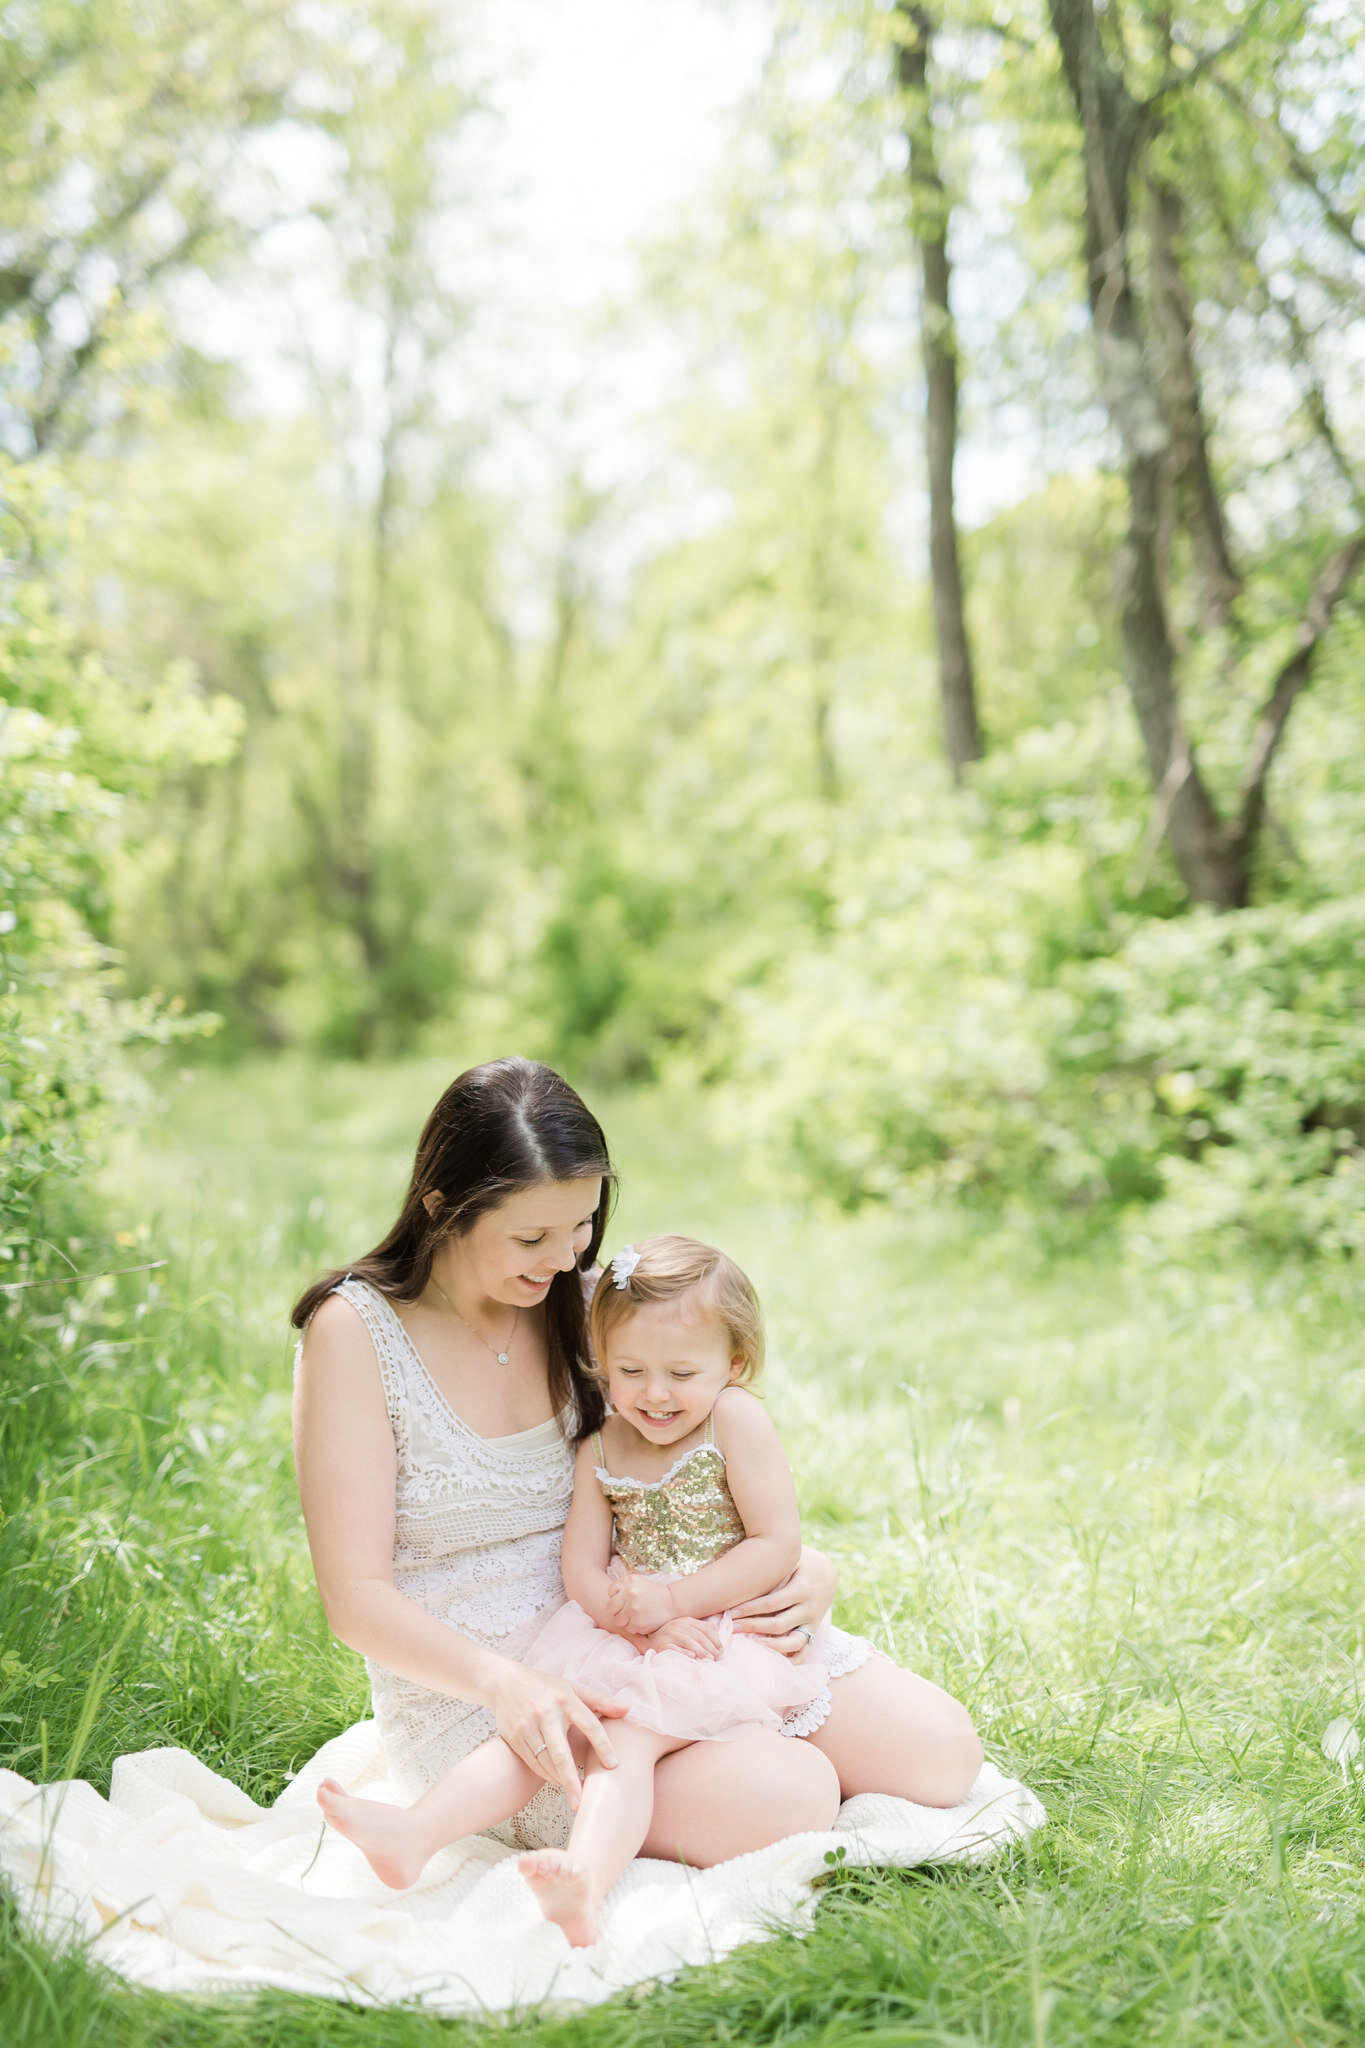 ct motherhood session_motherhood story CT_motherhood photographcer CT_14.jpg